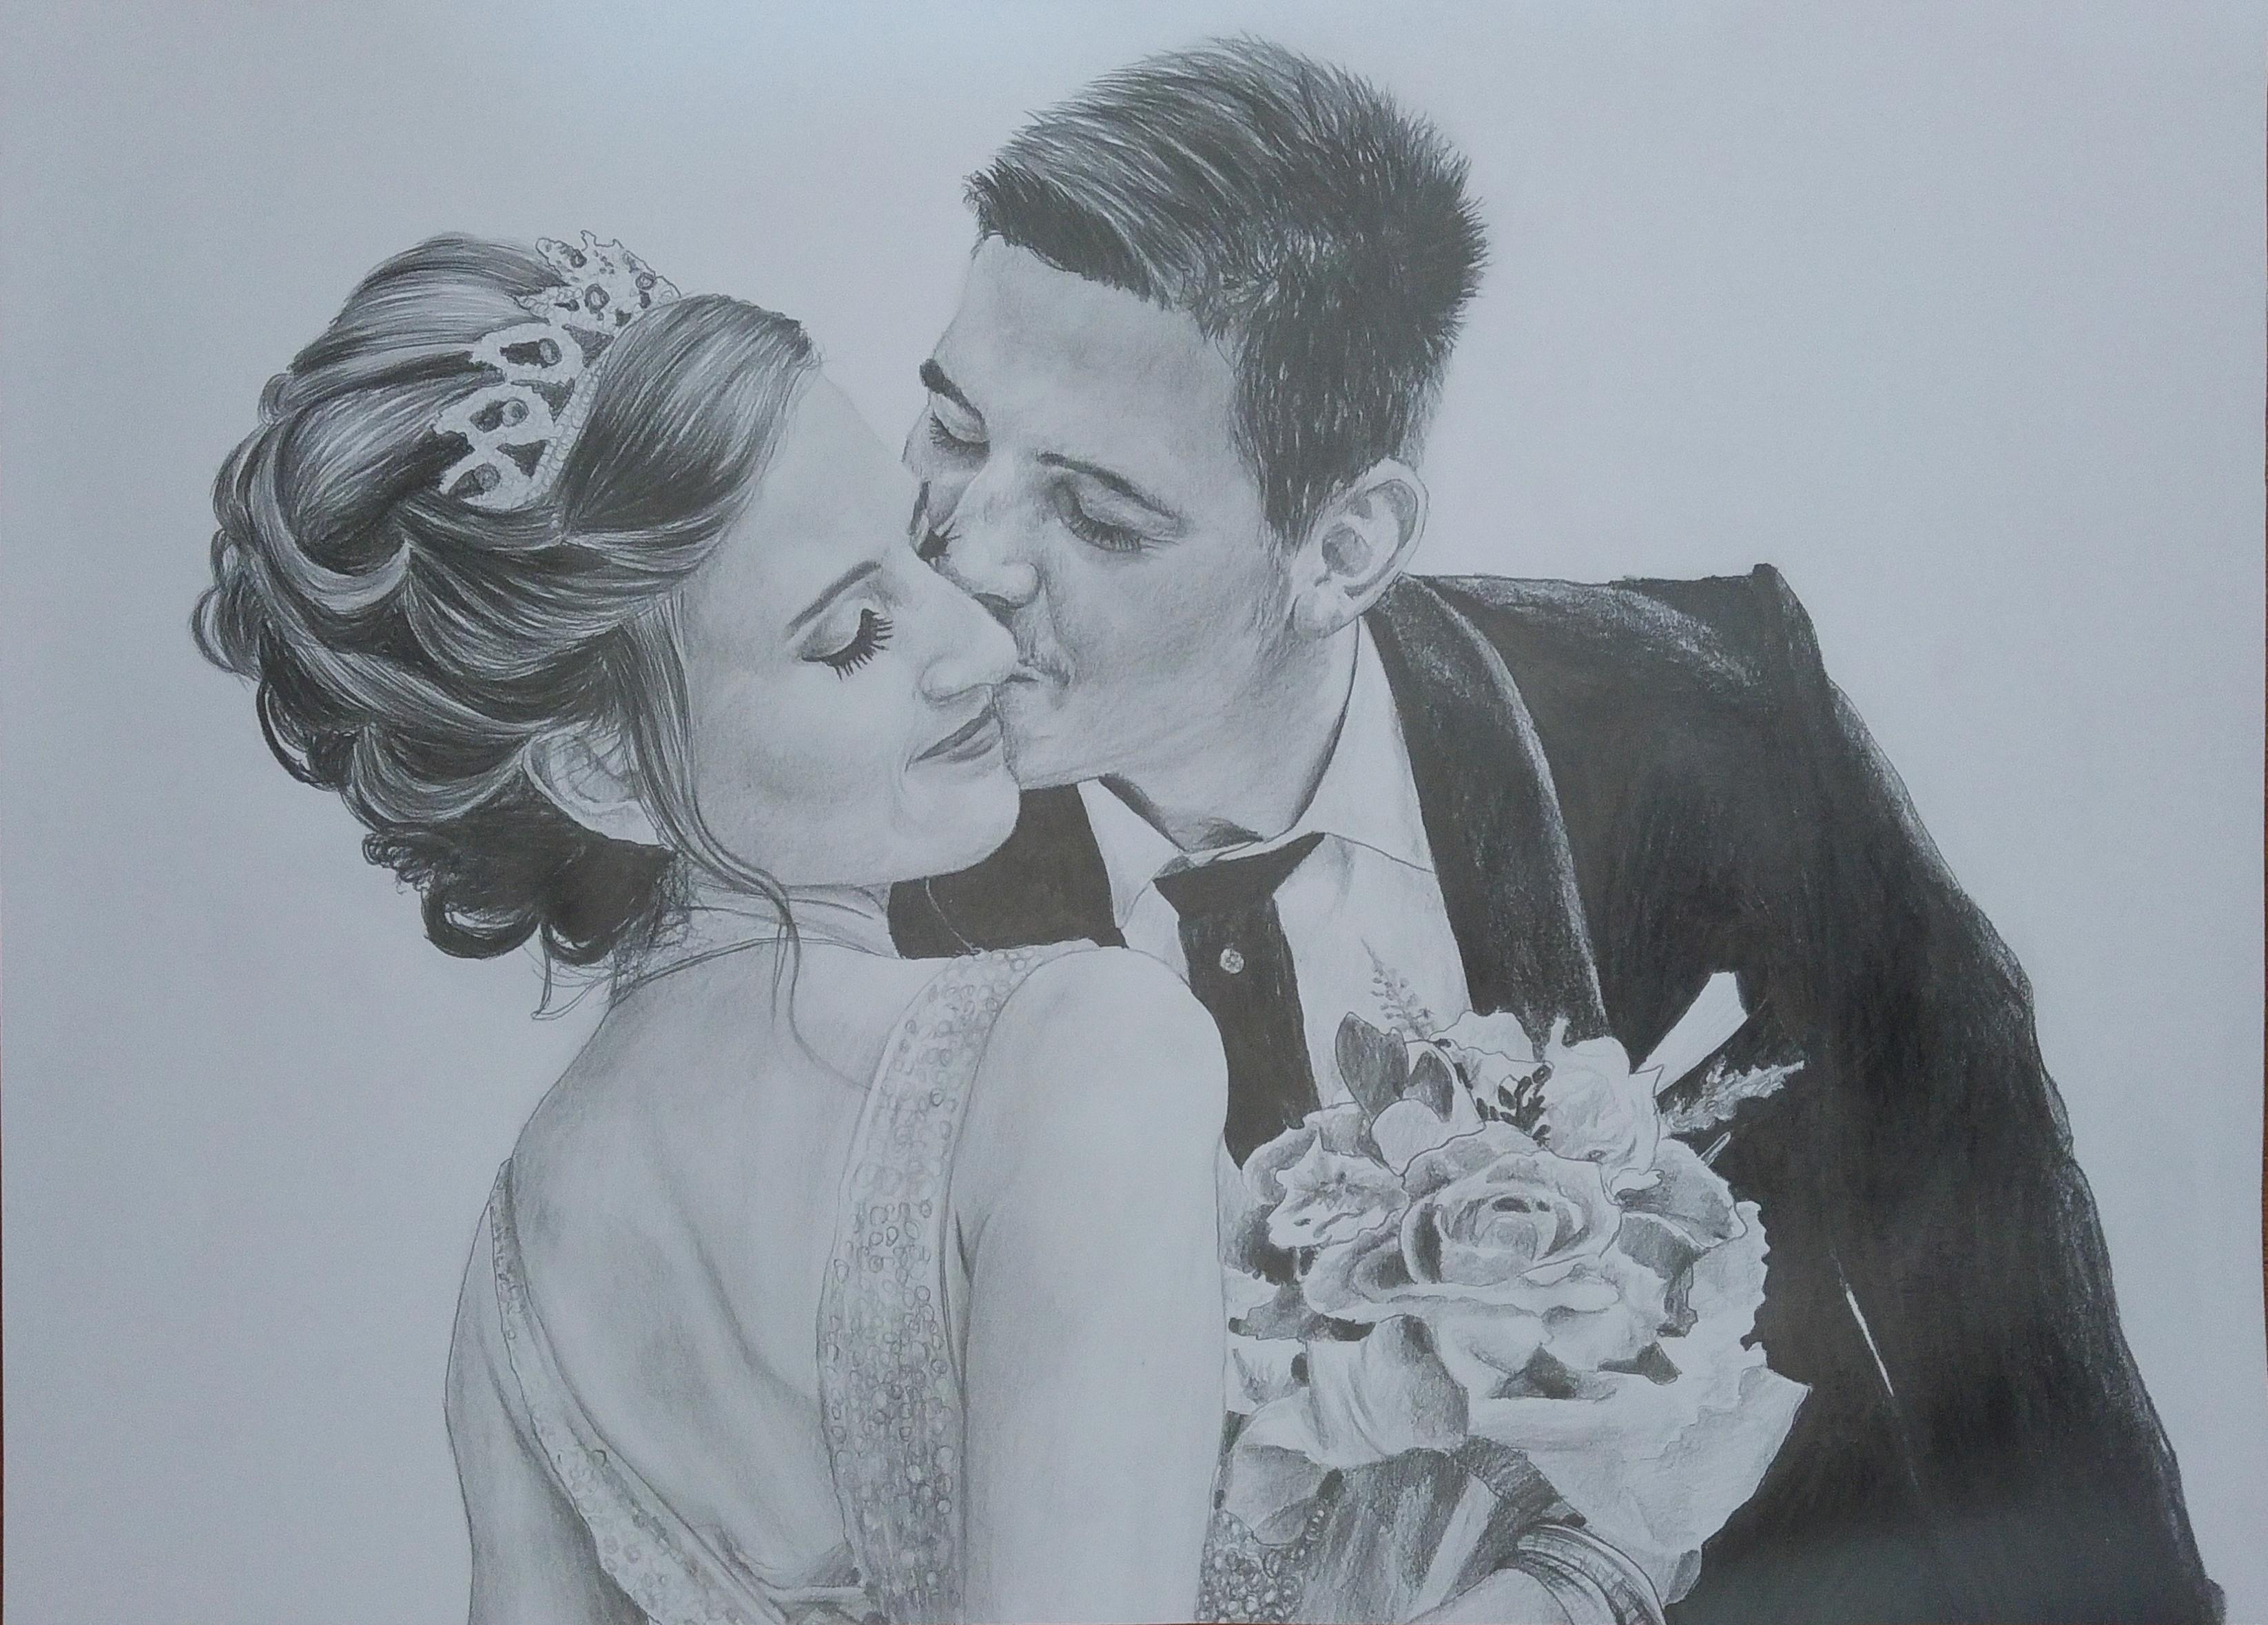 düğün karakalem portre